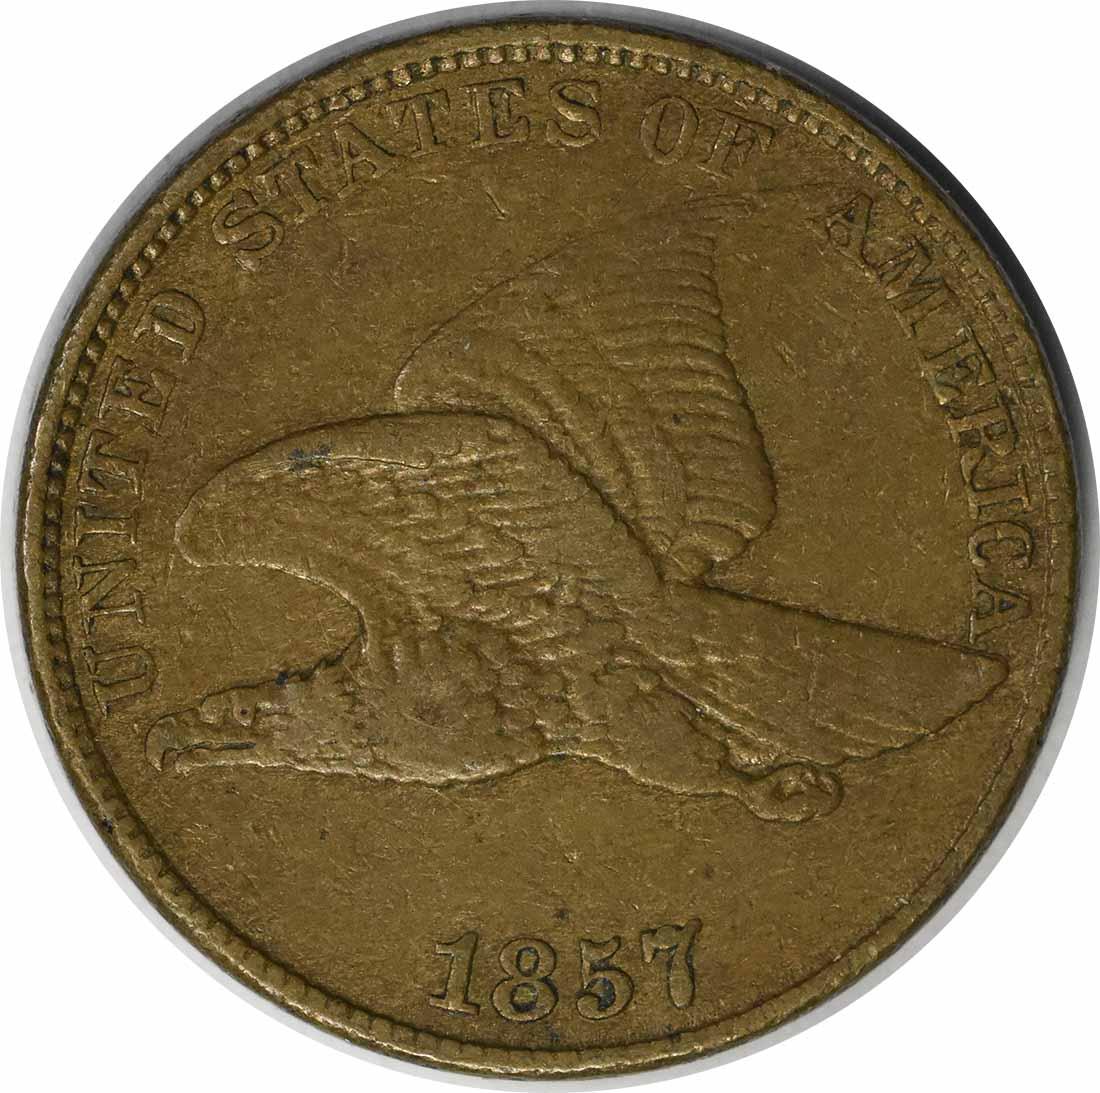 1857 Flying Eagle Cent DDO S-3 FS-105 EF Uncertified